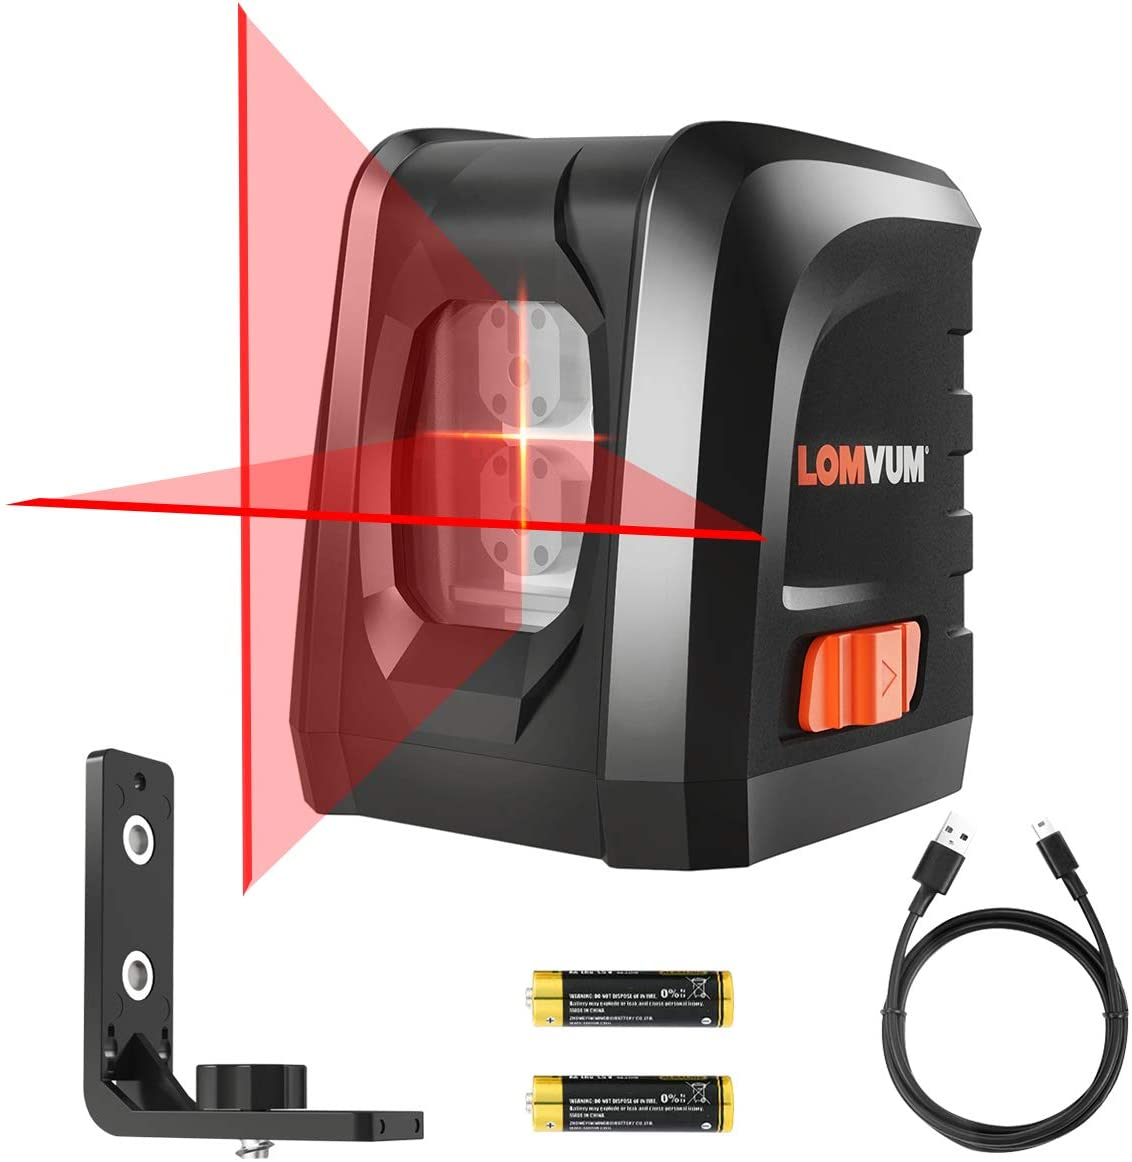 Lomvum Self-Leveling Laser Level 50FT Red Cross- Line Laser, DIY Line Laser with Free Batteries,Charging Cable, Bracket